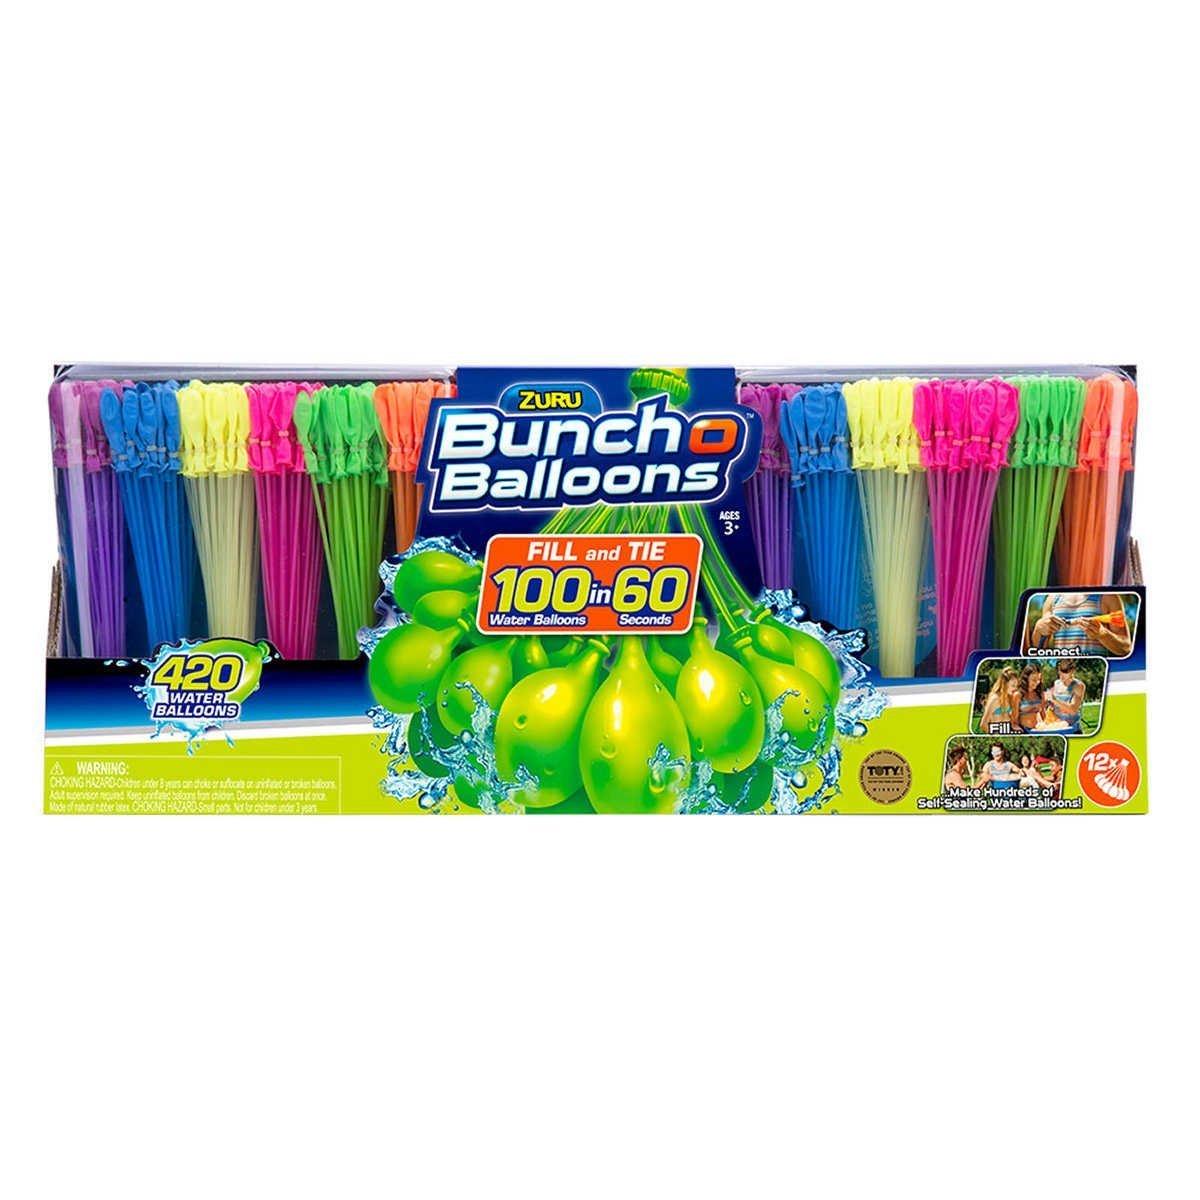 Bunch O Balloons WATER BALLOONS - BUNCH OF BALLOONS RAPID REFILL … (420 Balloons)